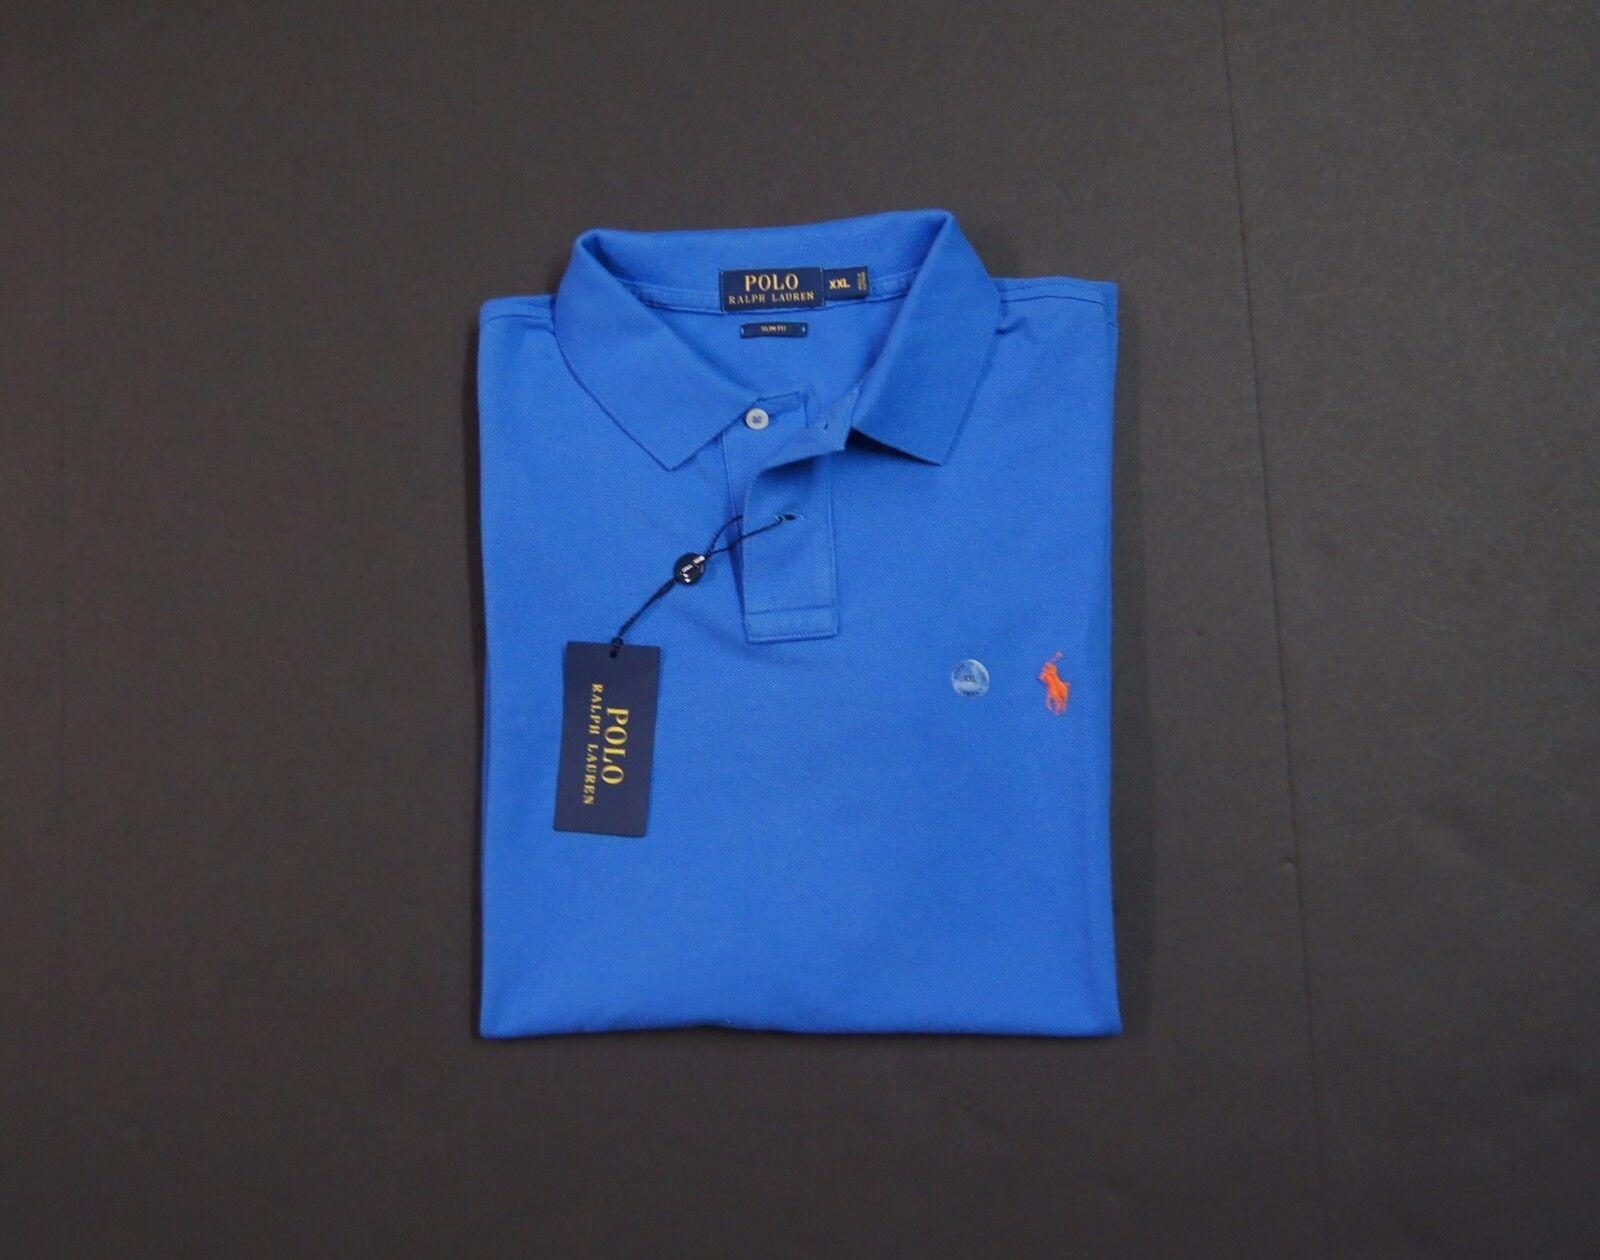 POLO RALPH LAUREN Slim Fit Mesh Cotton Polo Shirt Cyan bluee NEW NWT